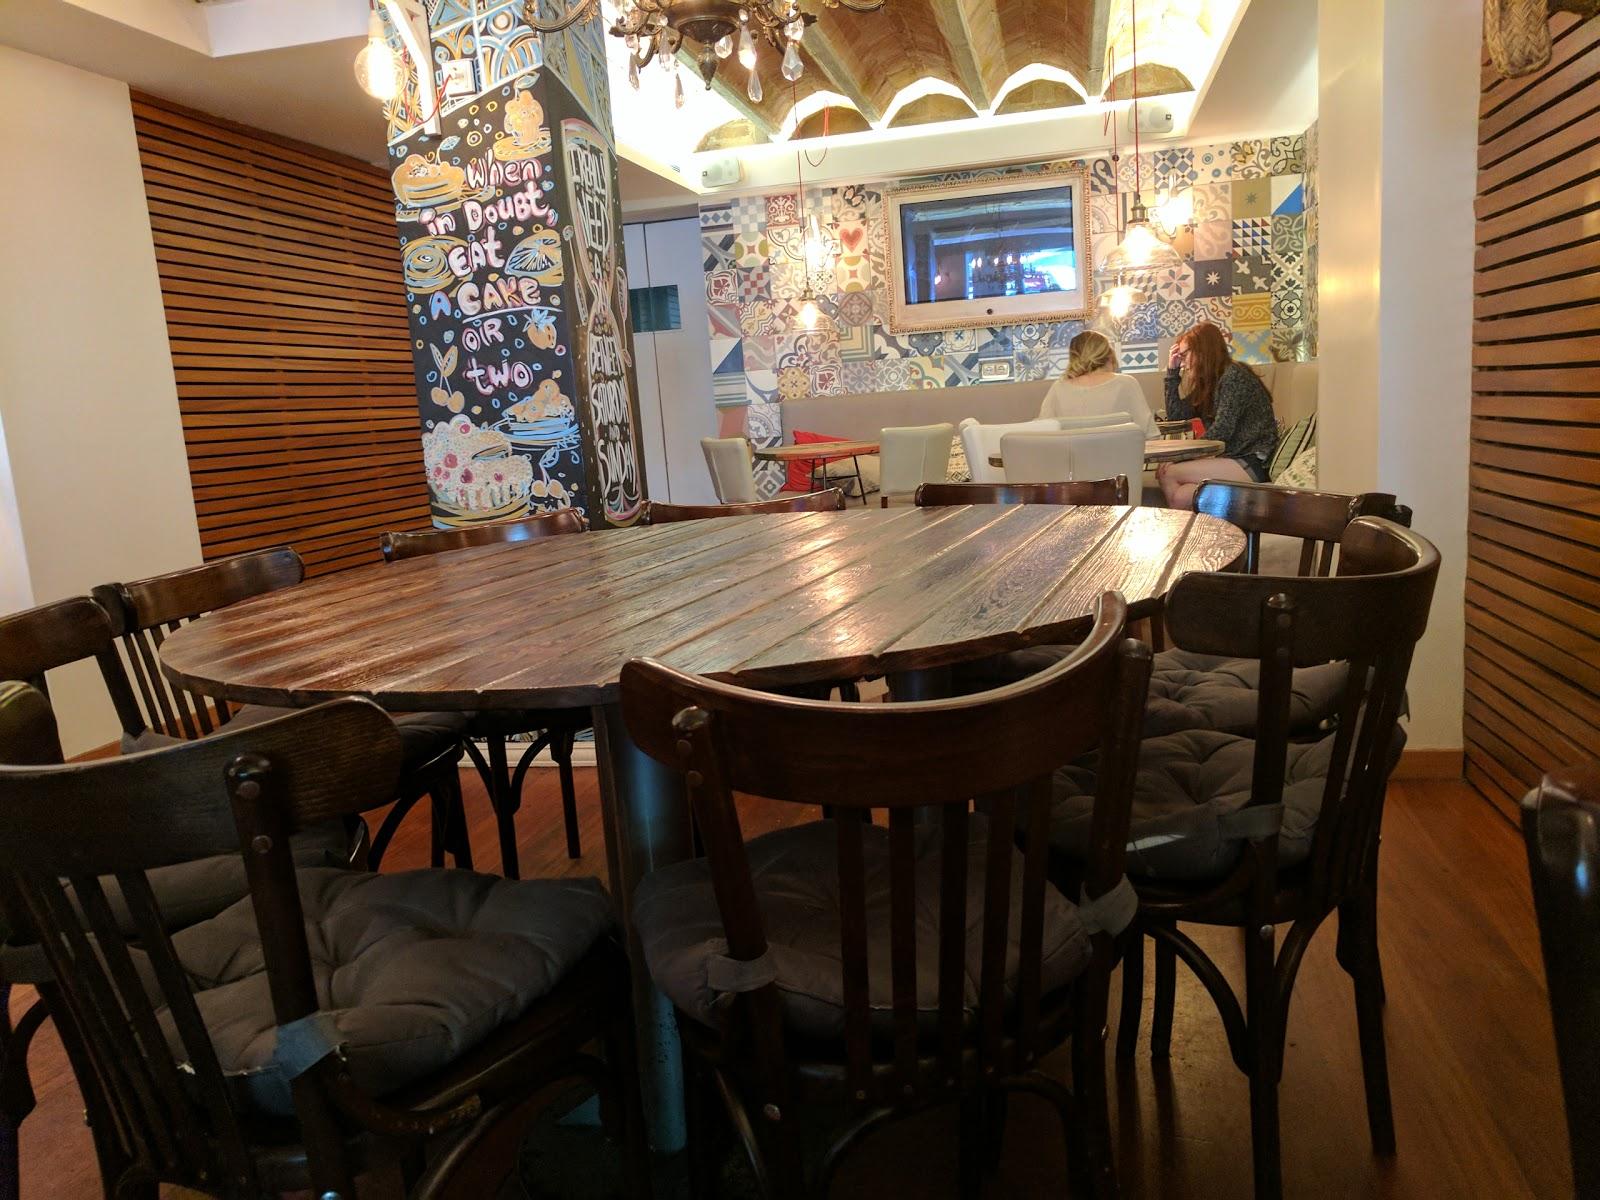 Alsur Café (Llúria): A Work-Friendly Place in Barcelona